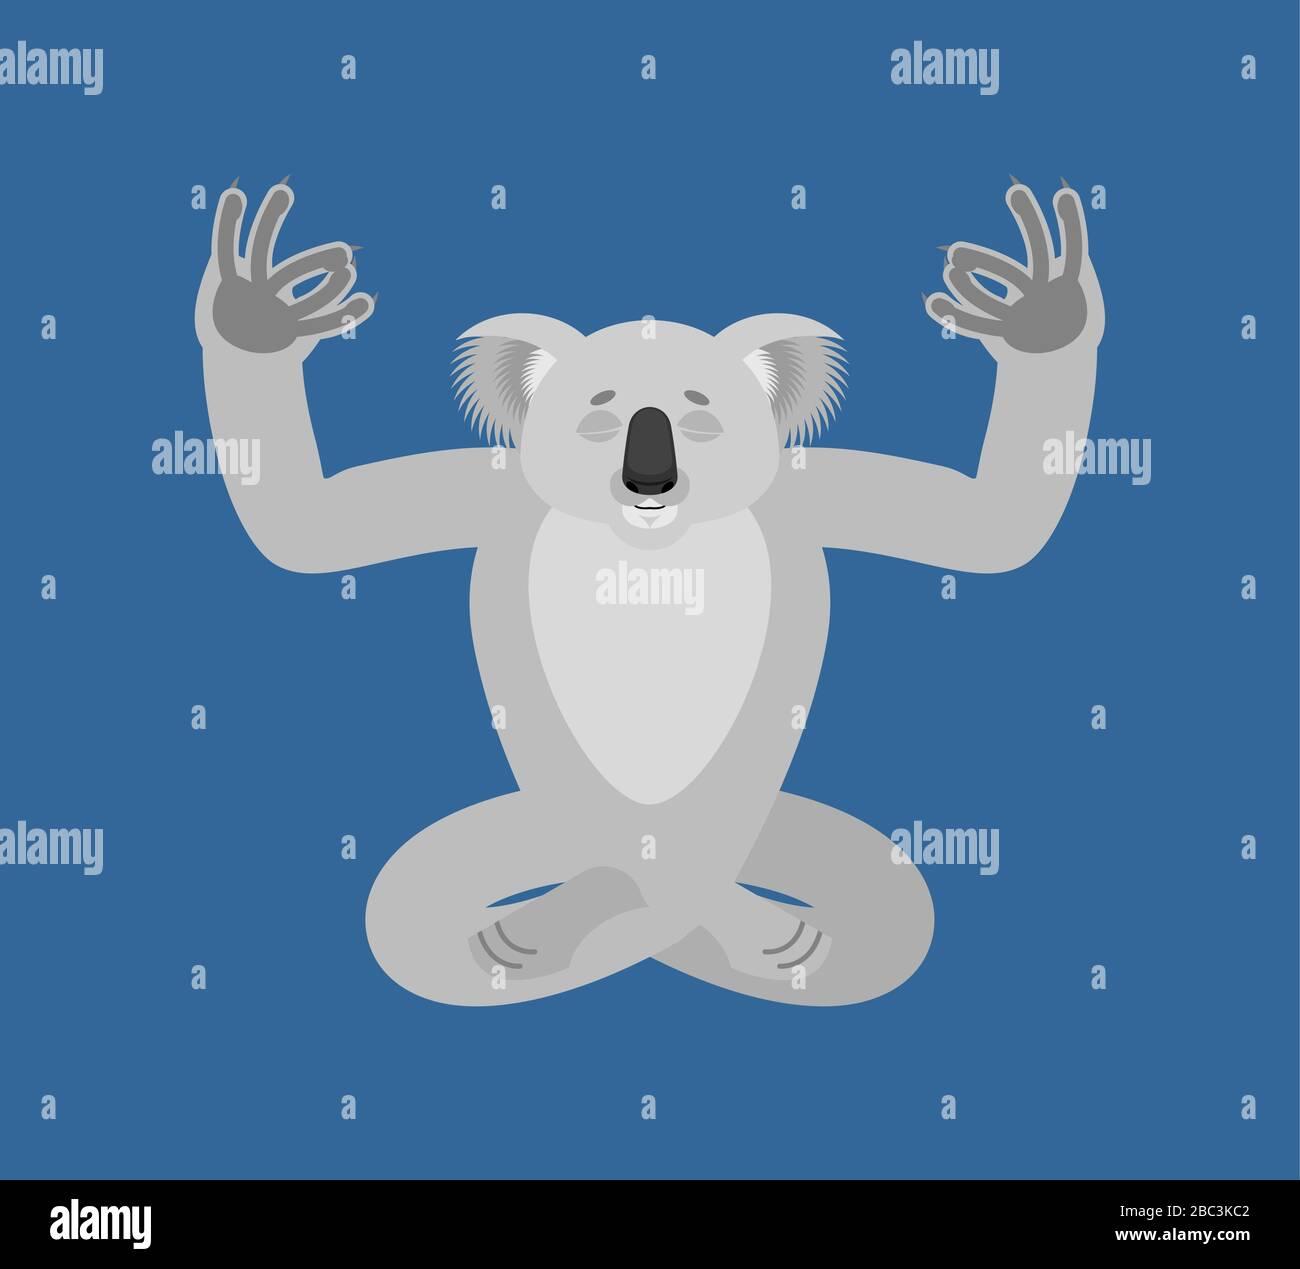 Yogi Bear Cartoon High Resolution Stock Photography And Images Alamy